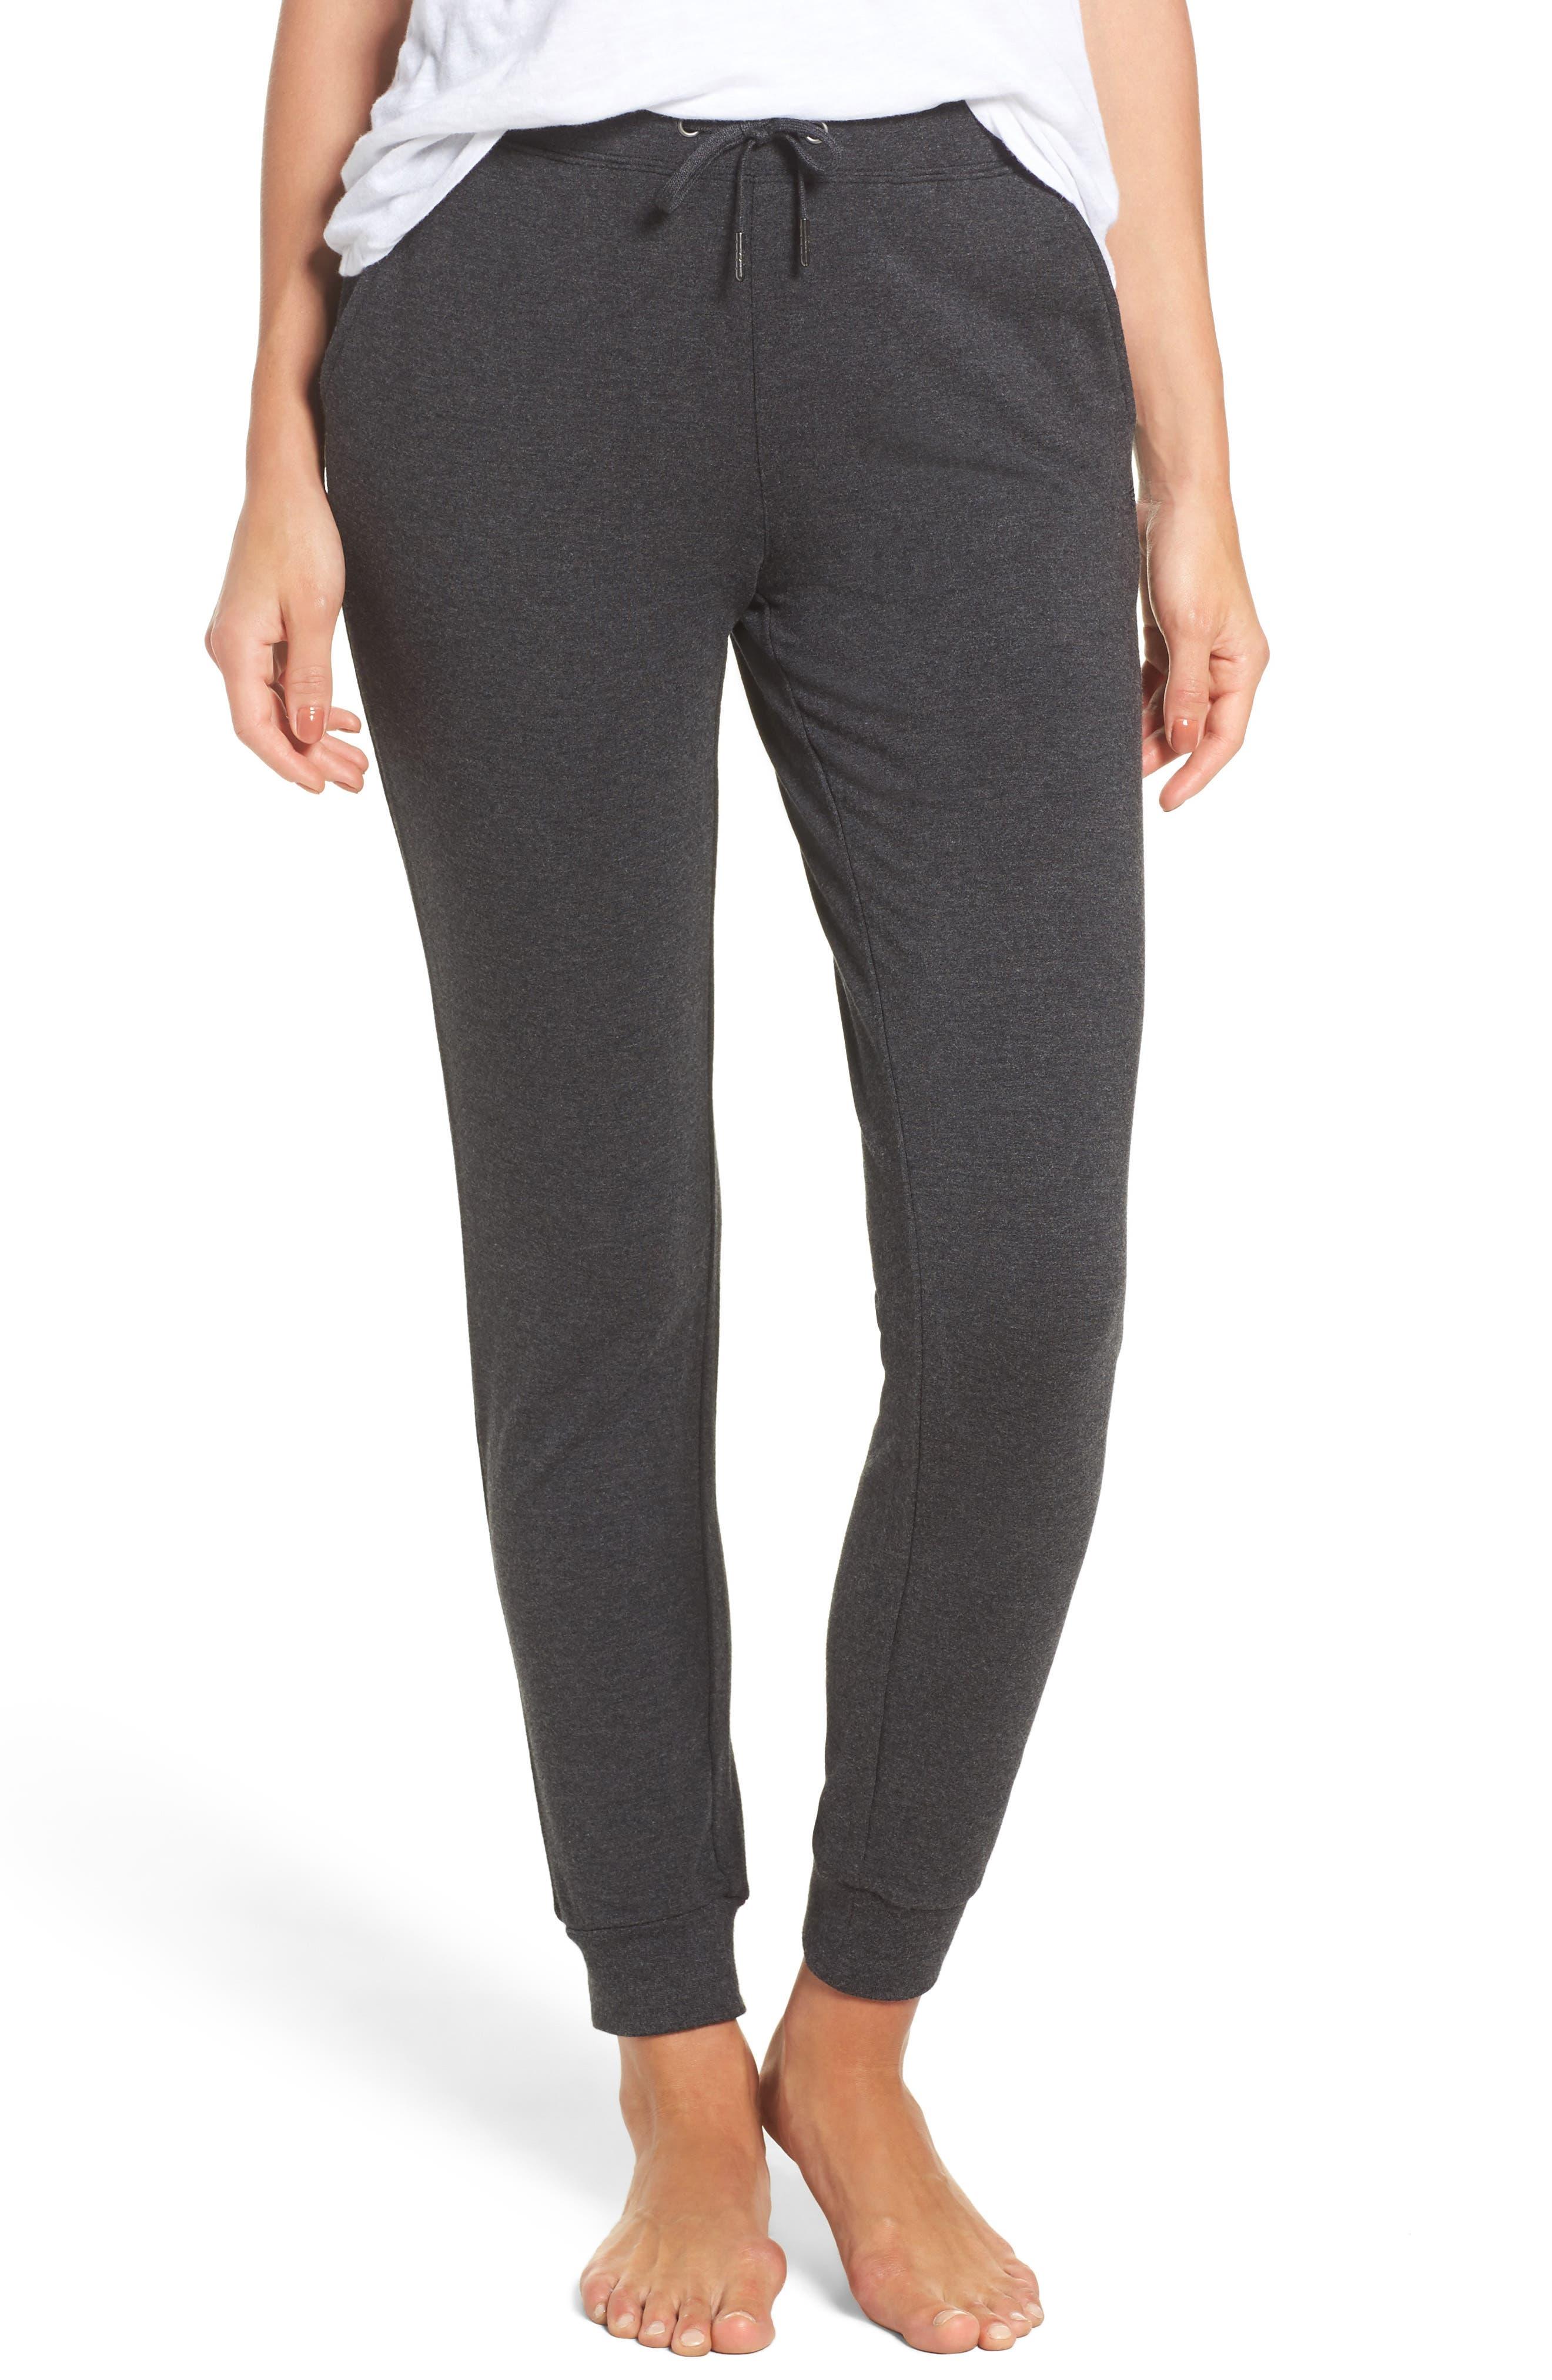 Alternate Image 1 Selected - UGG® Cozy Fleece Jogger Pants